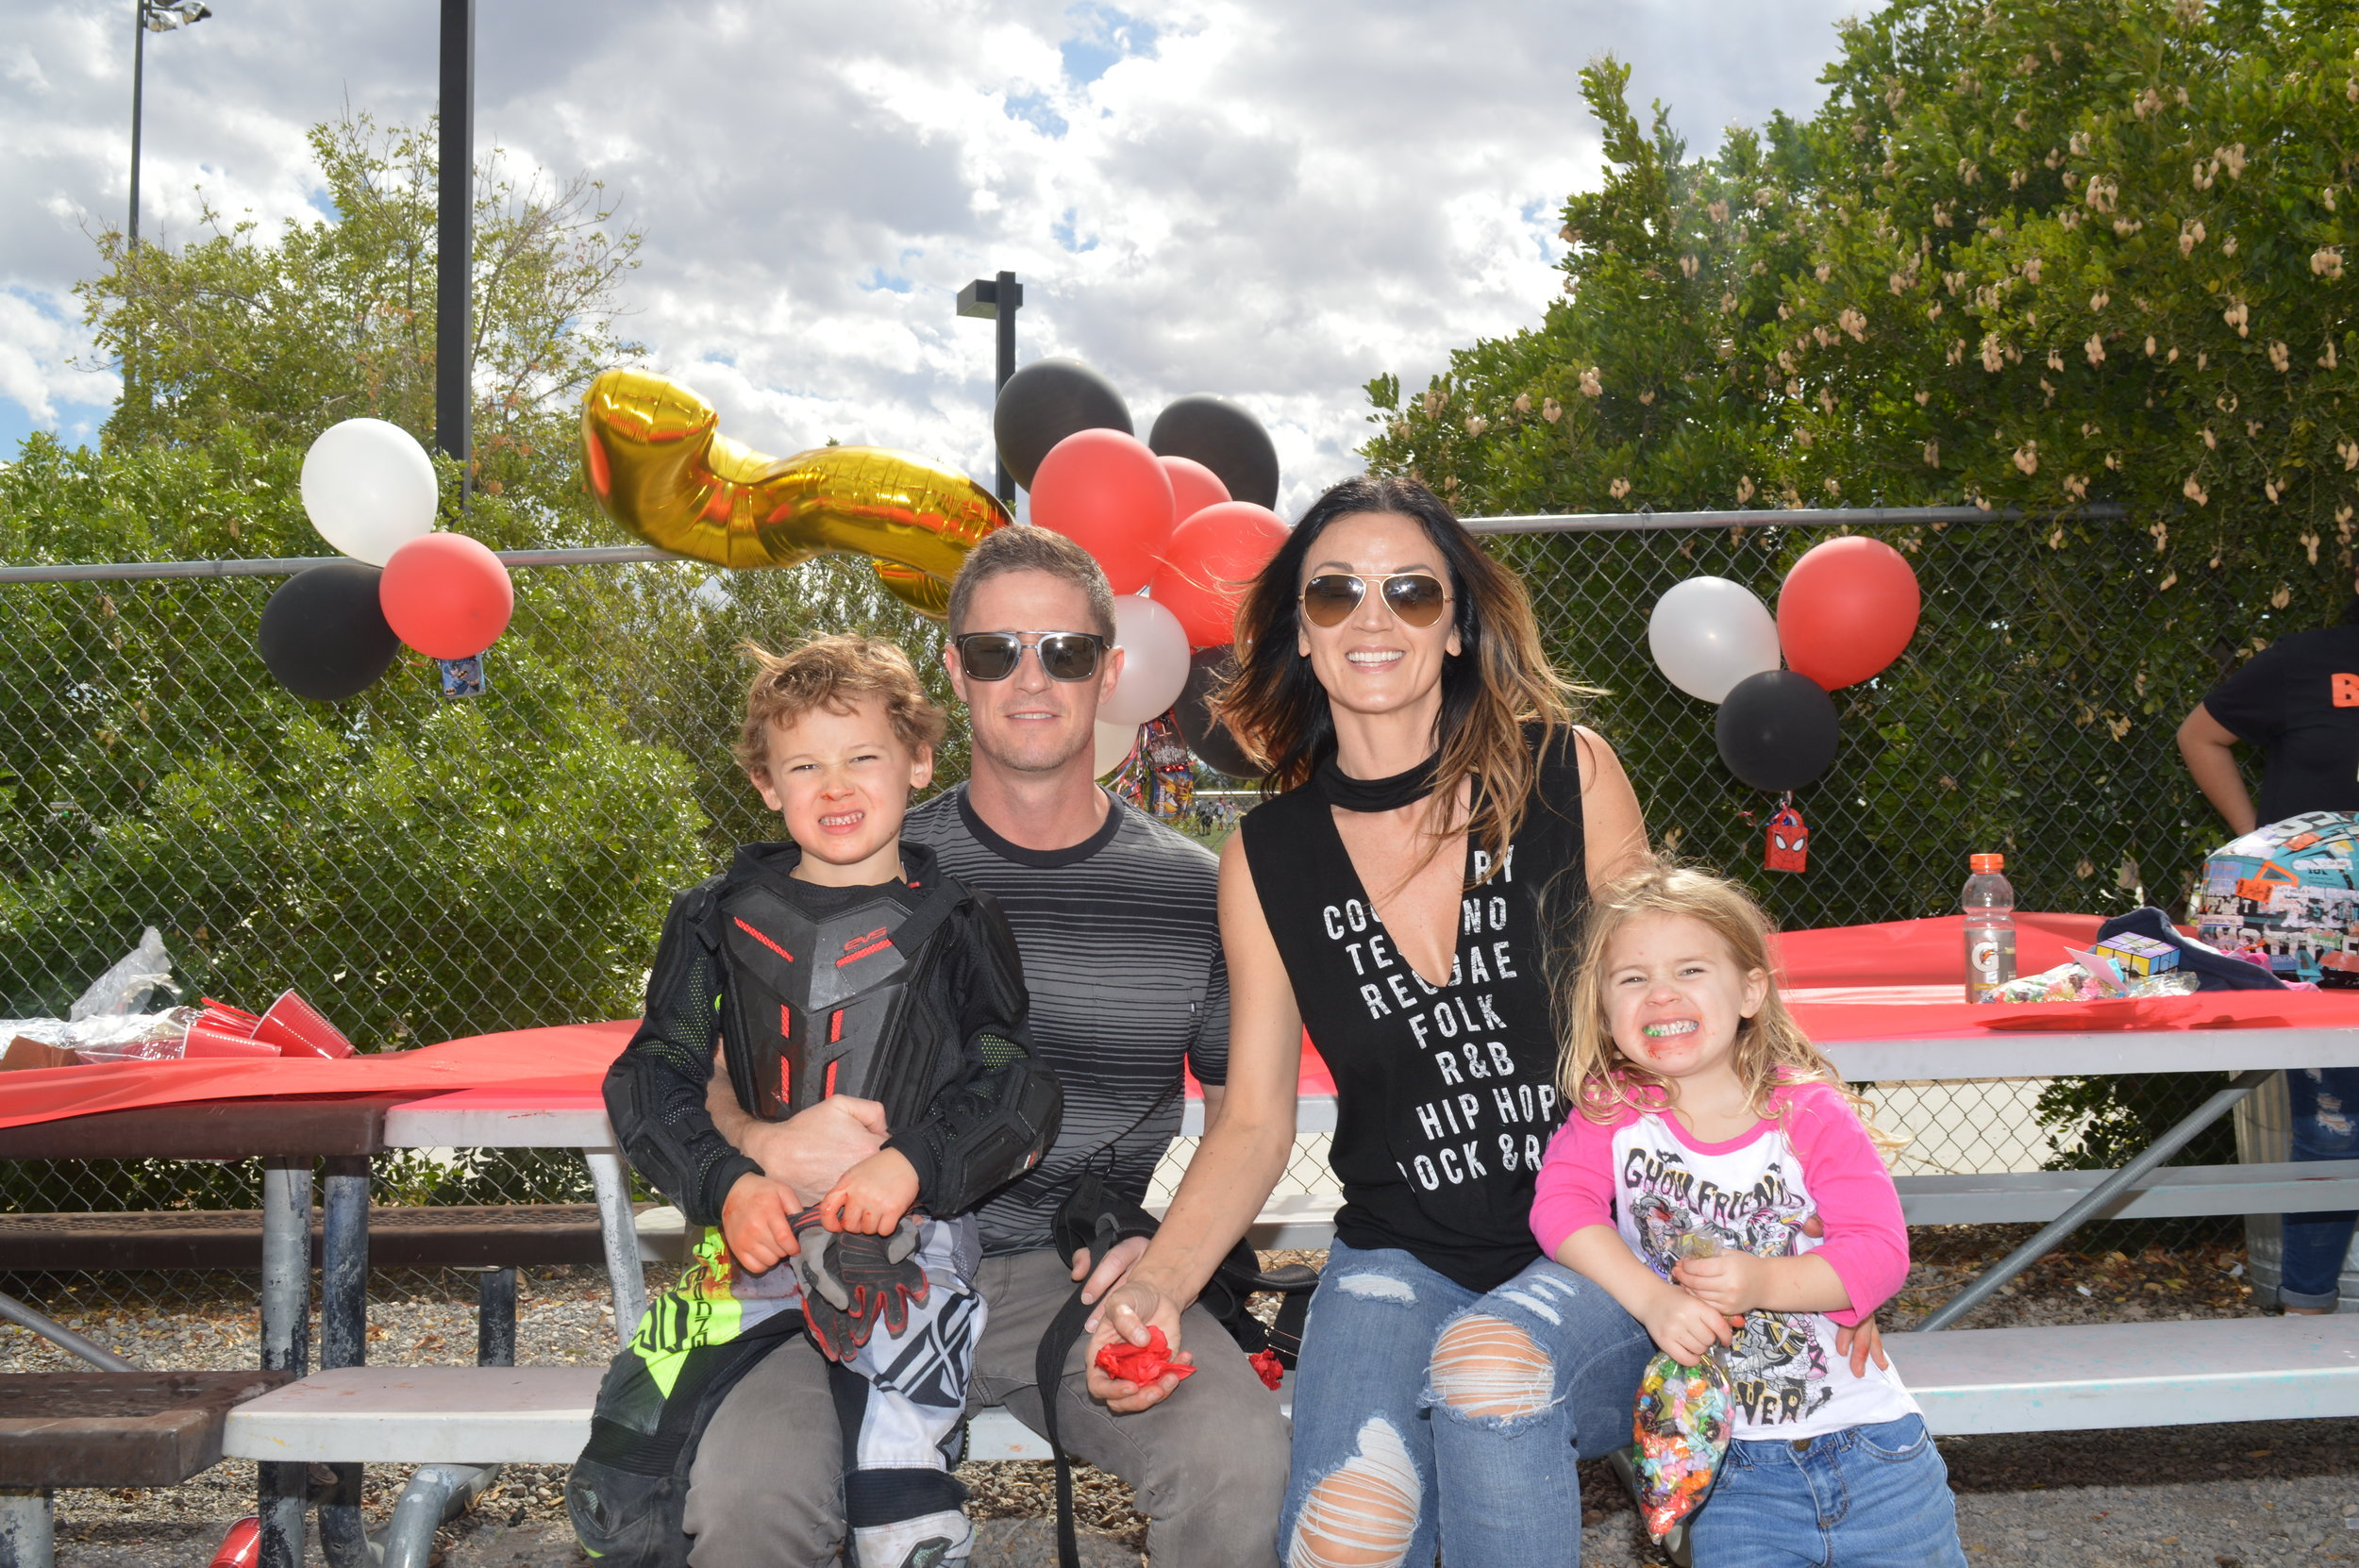 VEGAMAMA Aurora with her family; Birthday Boy Cache, now 5 years old, papa Adam Malan, VEGASMAMA Aurora & Sierra Malan.